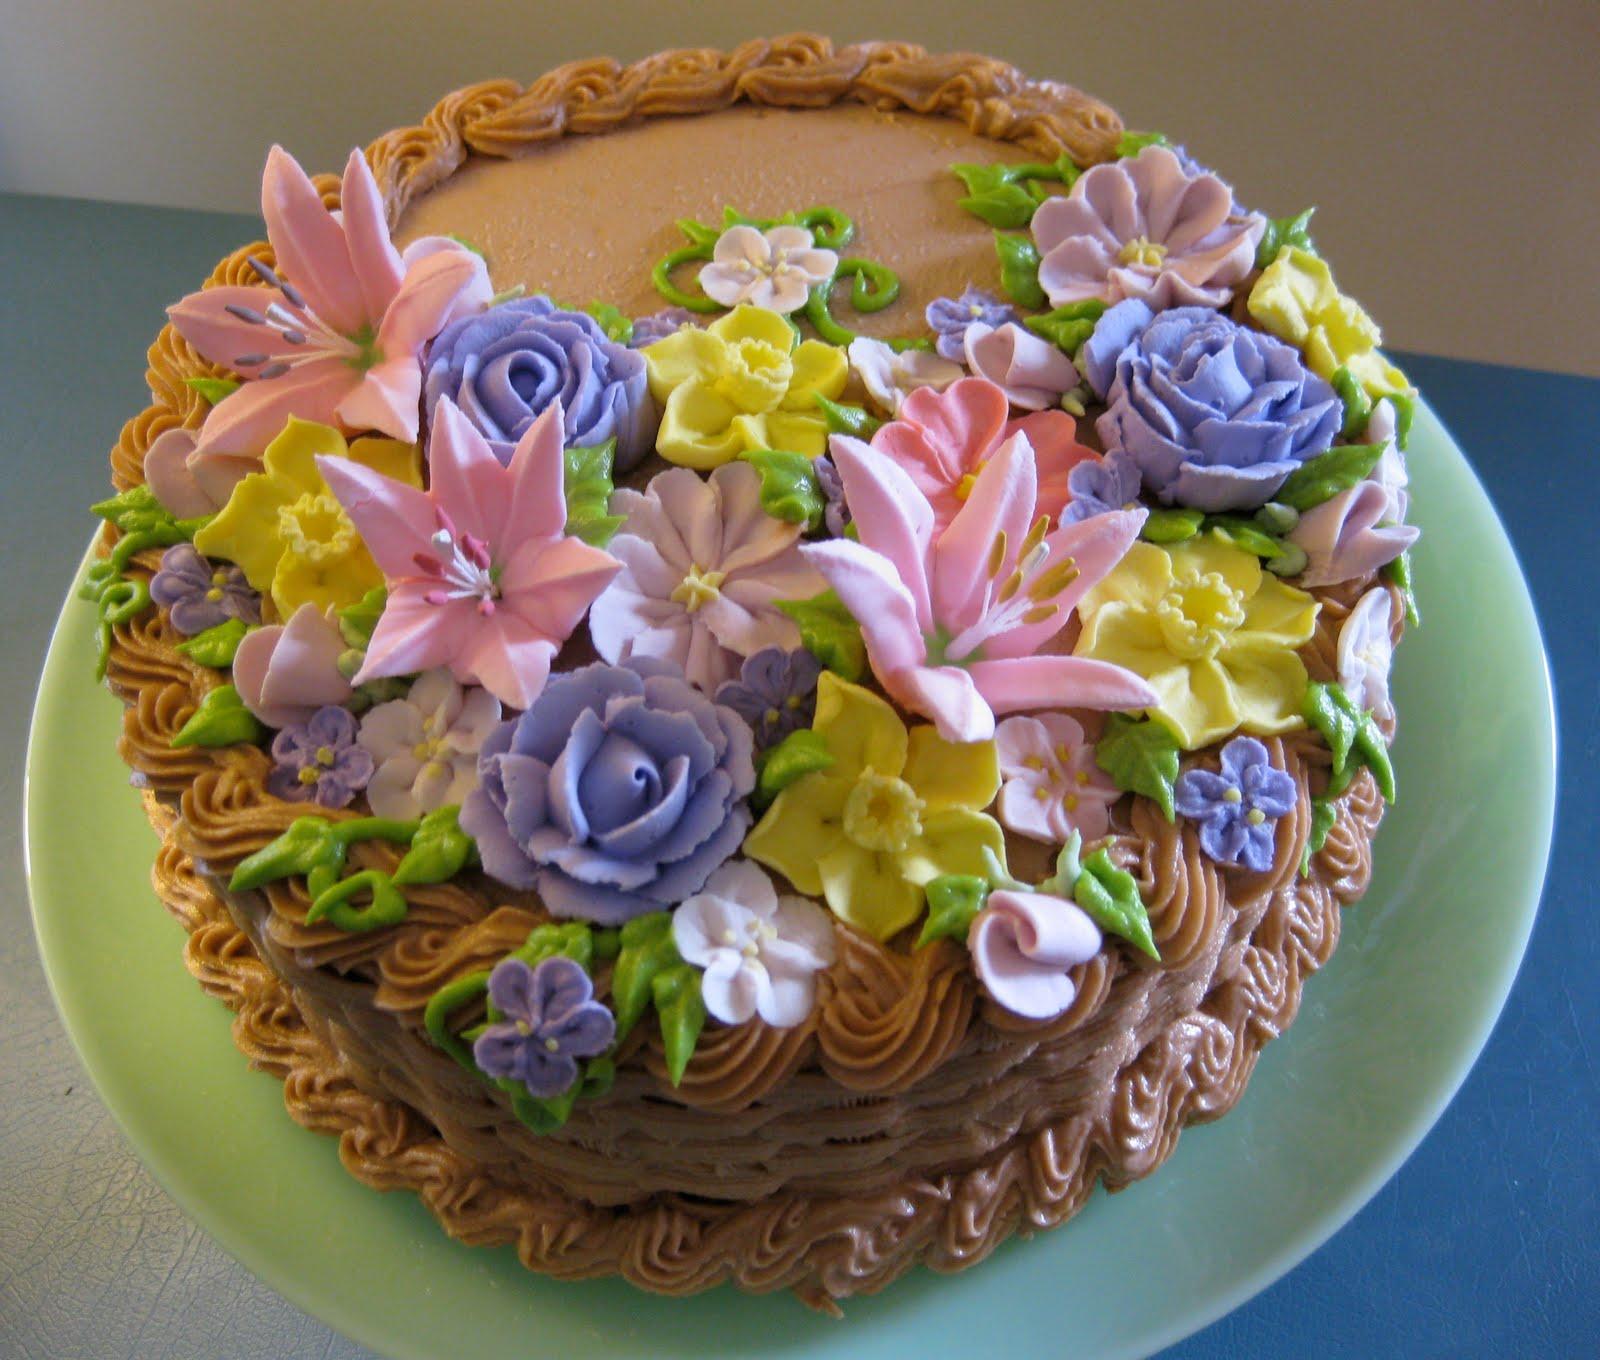 Flower Basket Mothers Day Cake : Stuffed cakes floral basket cake